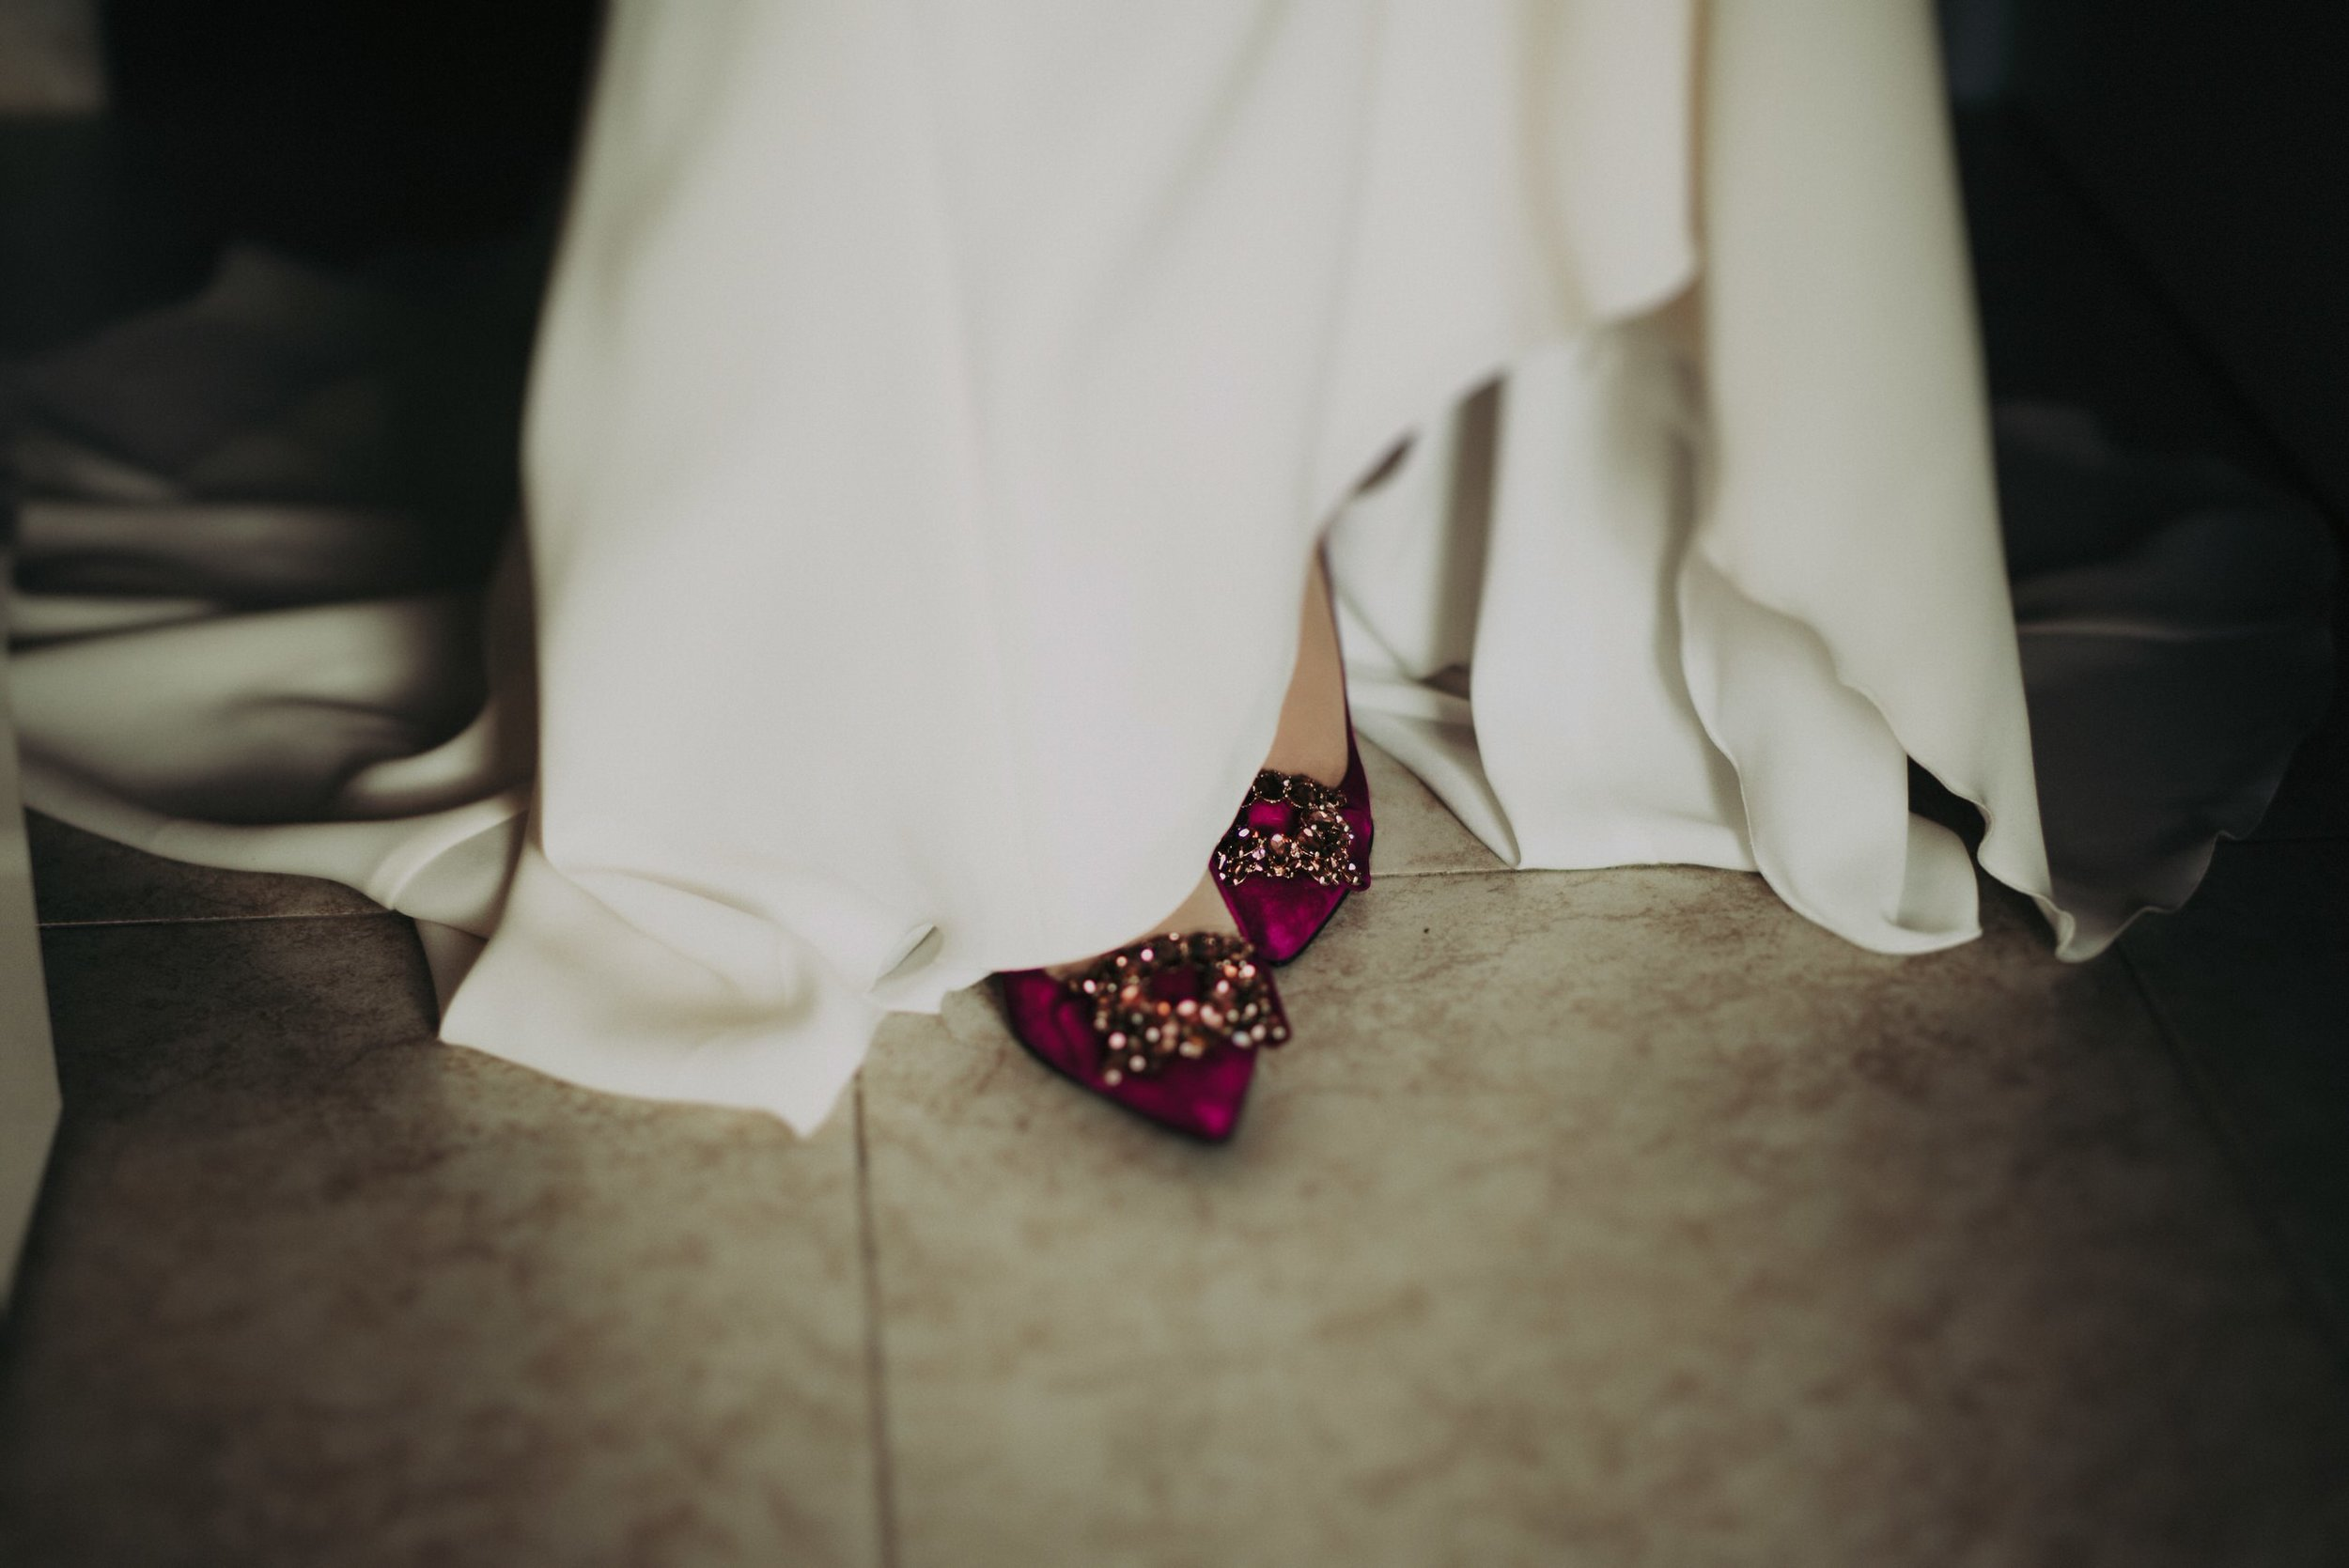 Laura & Rubén - boda en utrera - Santa clotilde- Manolo mayo - Fotografo de boda - Andrés Amarillo AAA_1075-Exposure (71).jpg